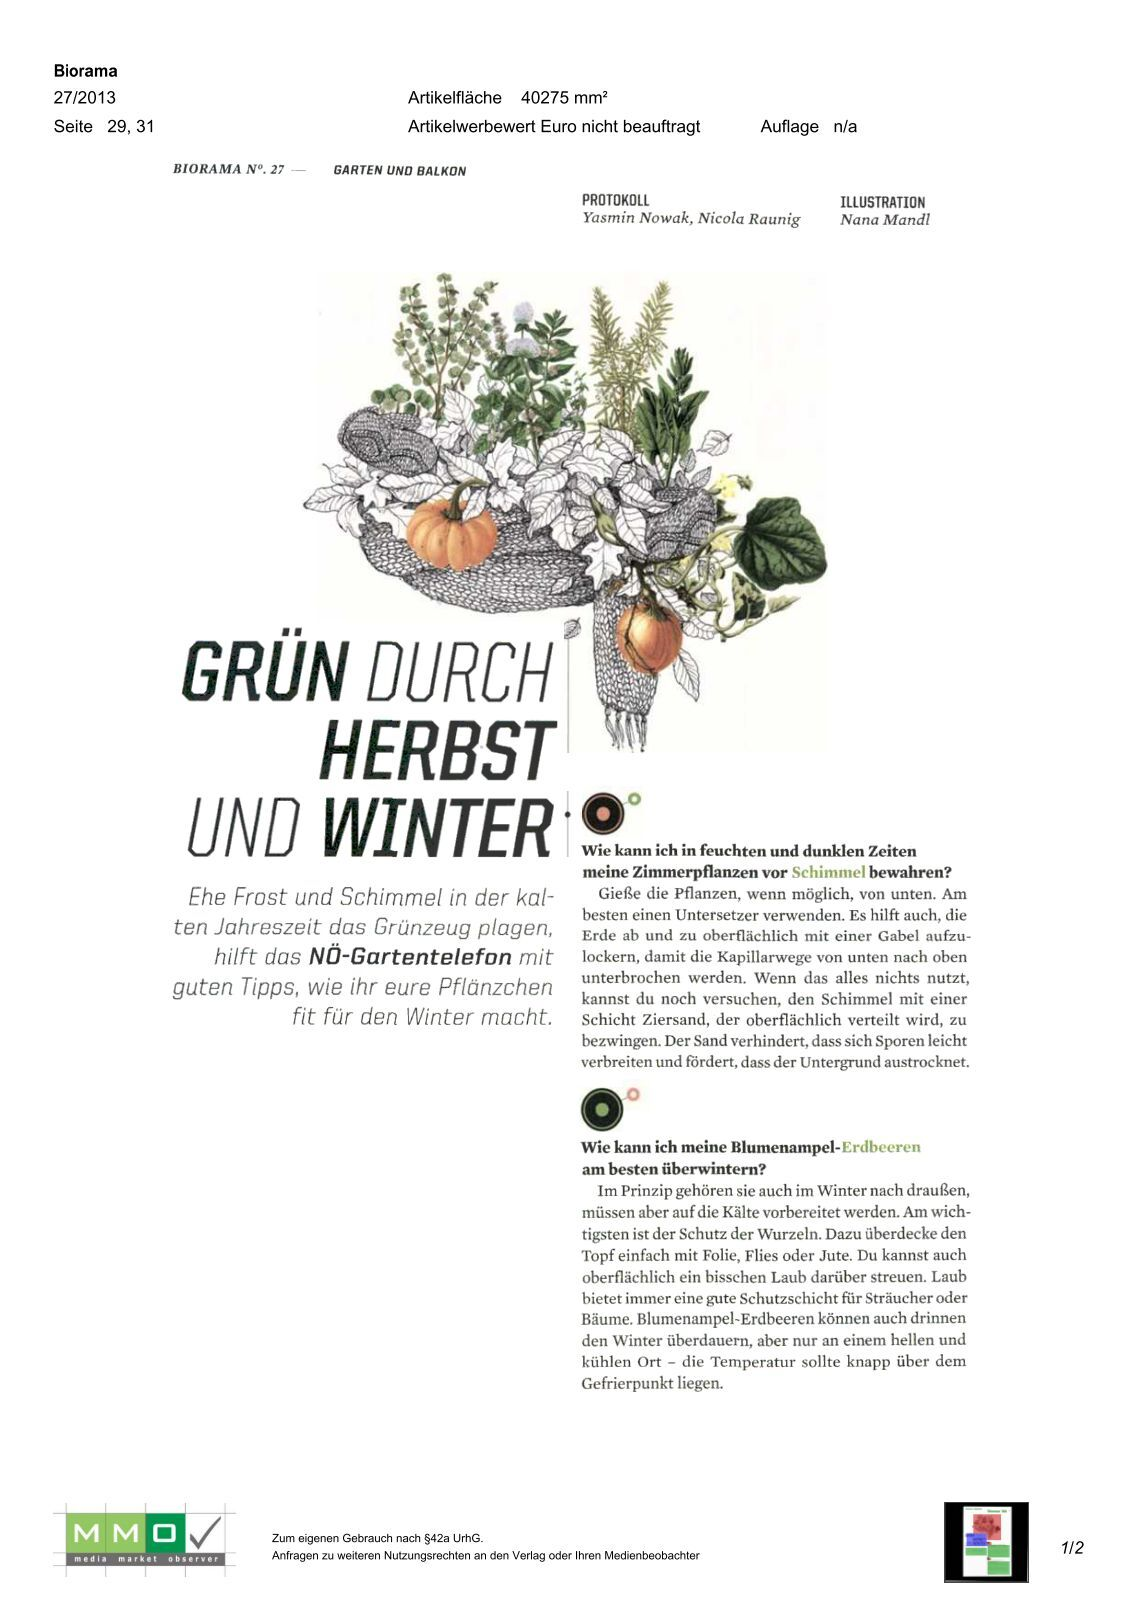 140 free magazines from naturimgarten at. Black Bedroom Furniture Sets. Home Design Ideas